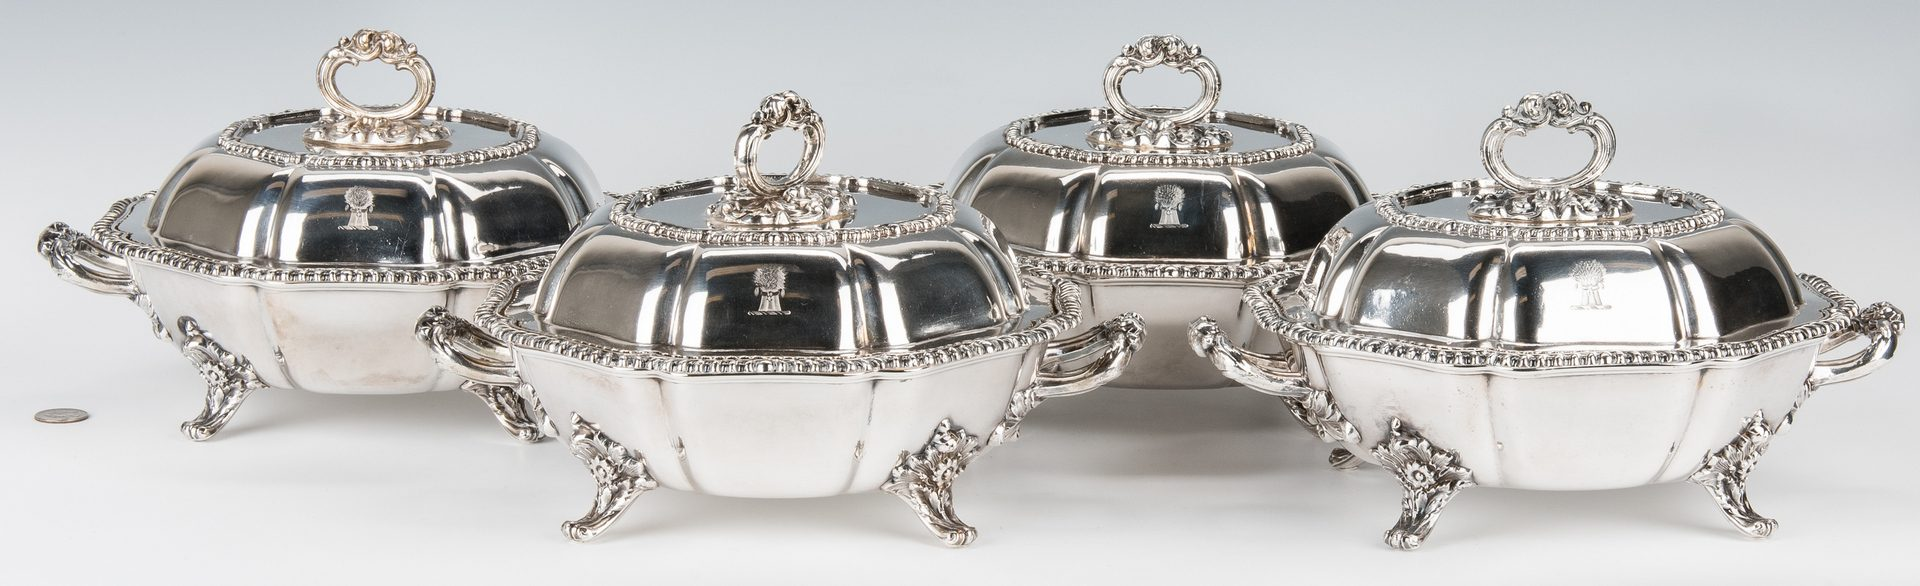 Lot 66: 4 Matthew Boulton Armorial Entree Dishes